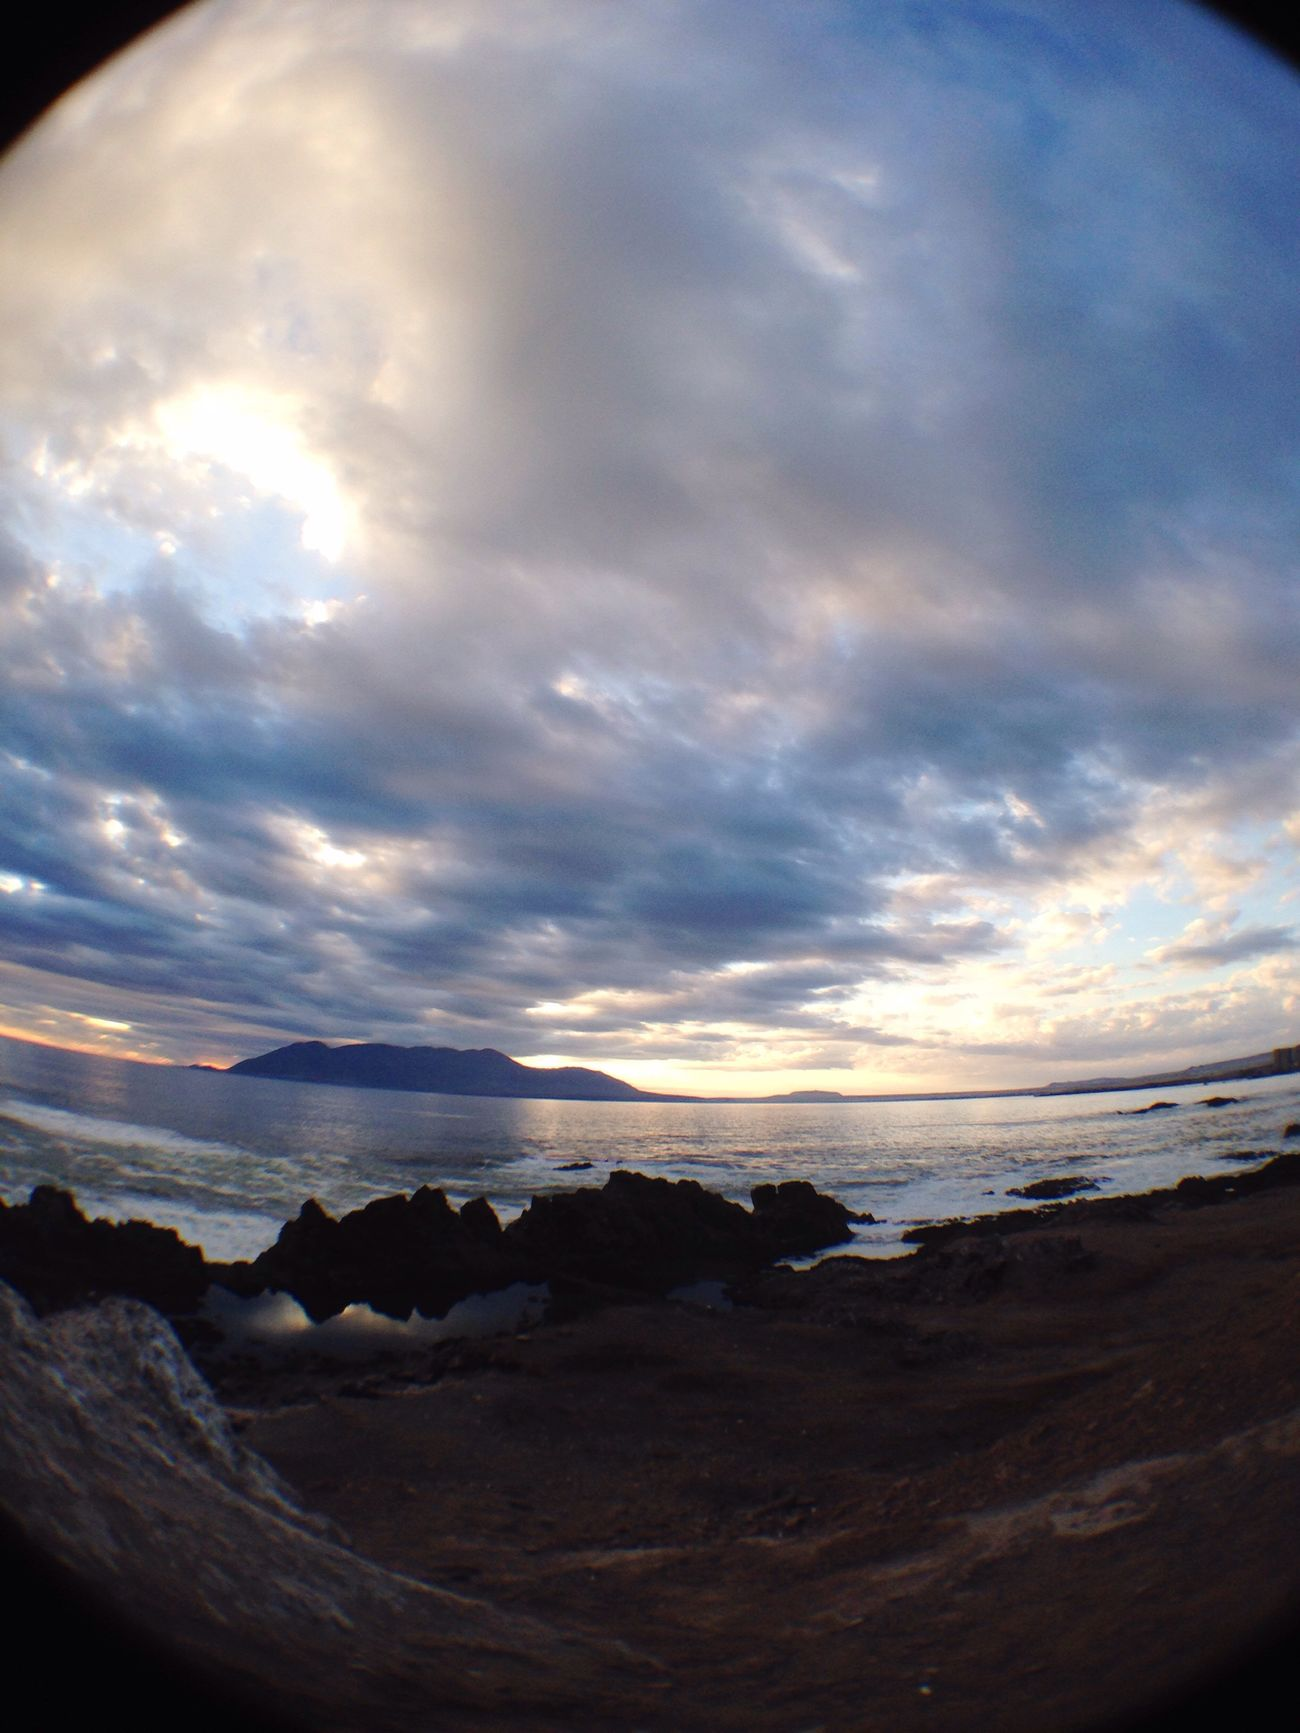 Beauty In Nature Water Beach Nature Scenics Sunset Tranquility Sky Wave Antofagasta Fisheye